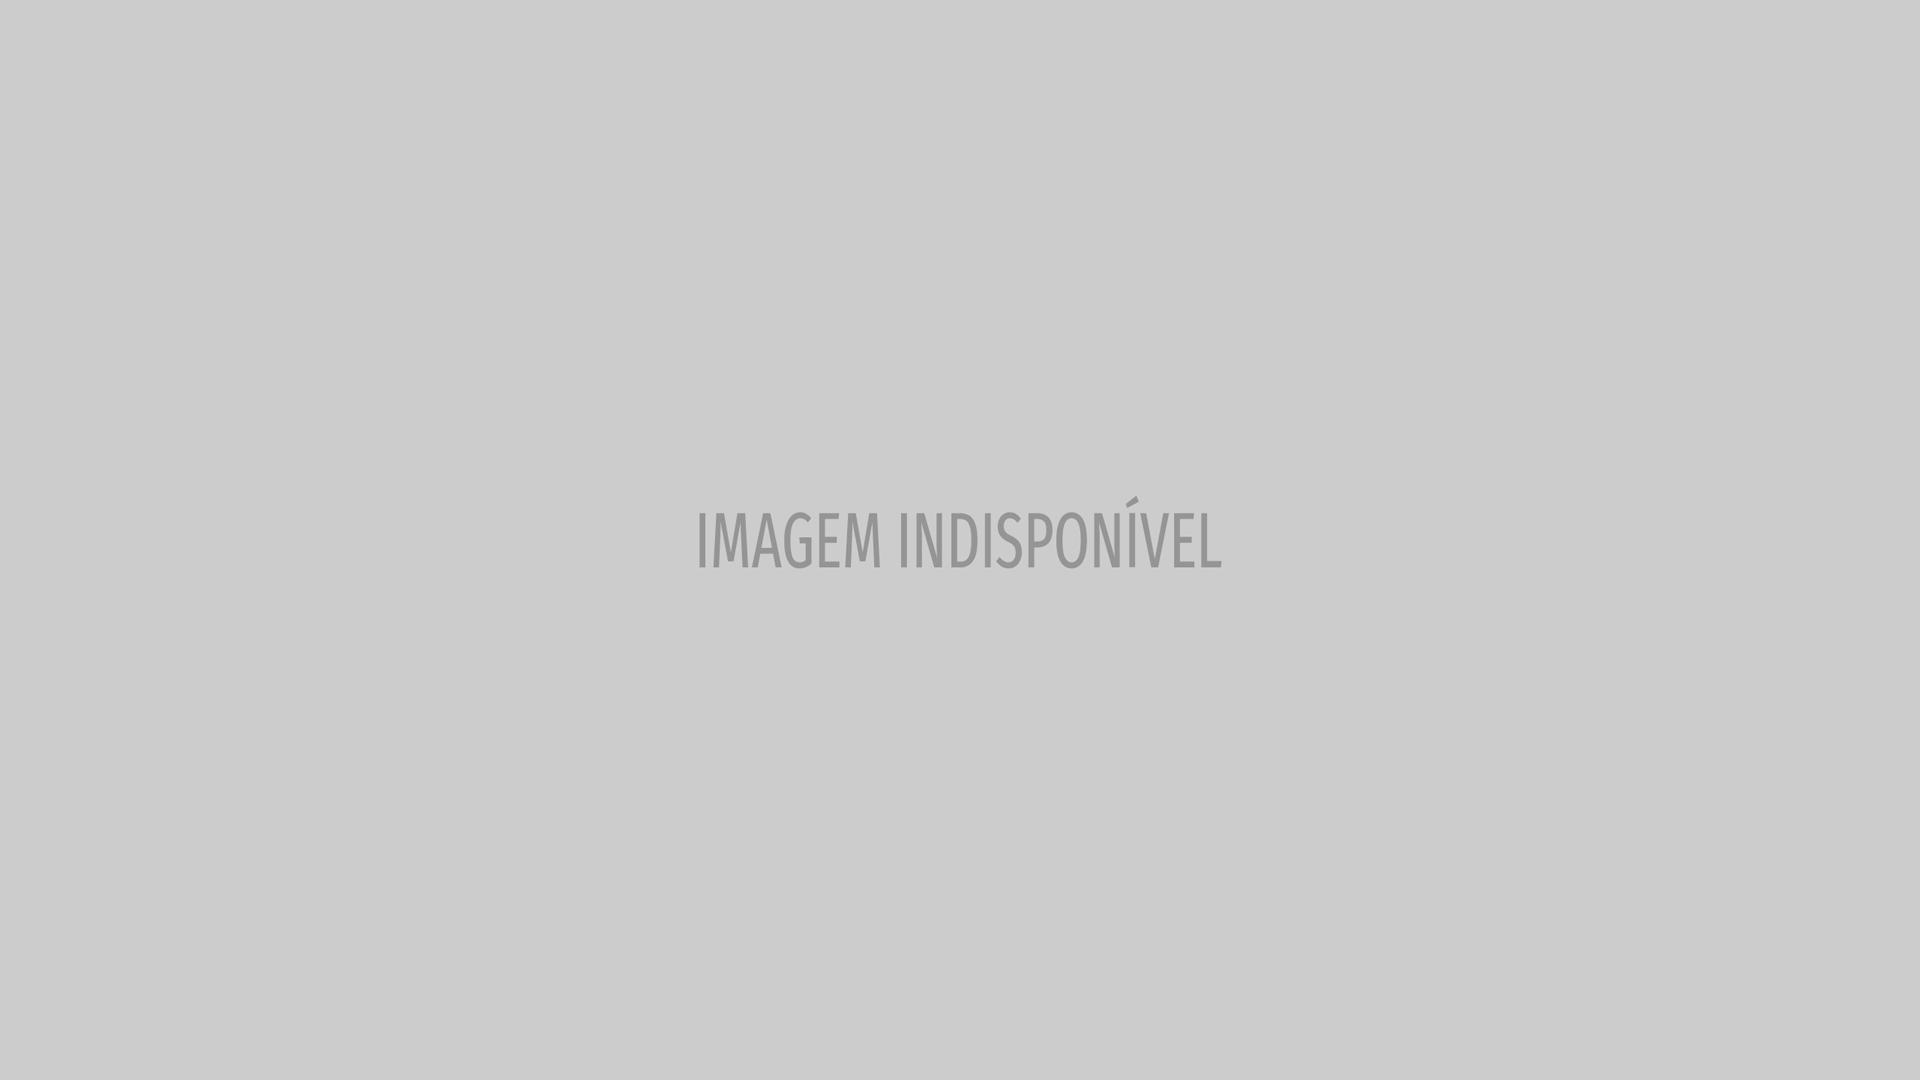 Maitê Proença regressa a Portugal dez anos após vídeo polémico